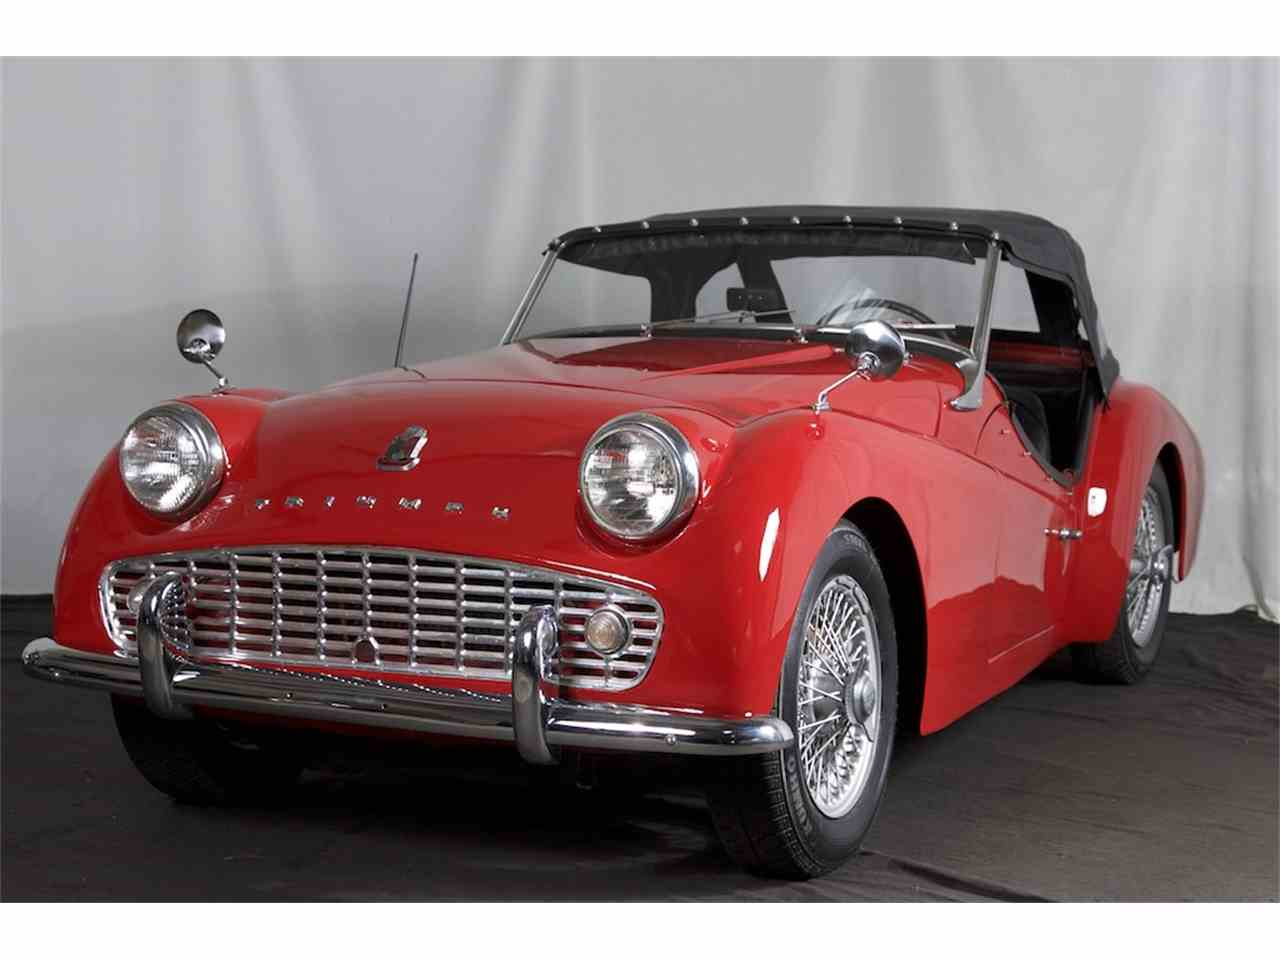 Classic Cars For Sale California Usa: 1959 Triumph TR3A For Sale